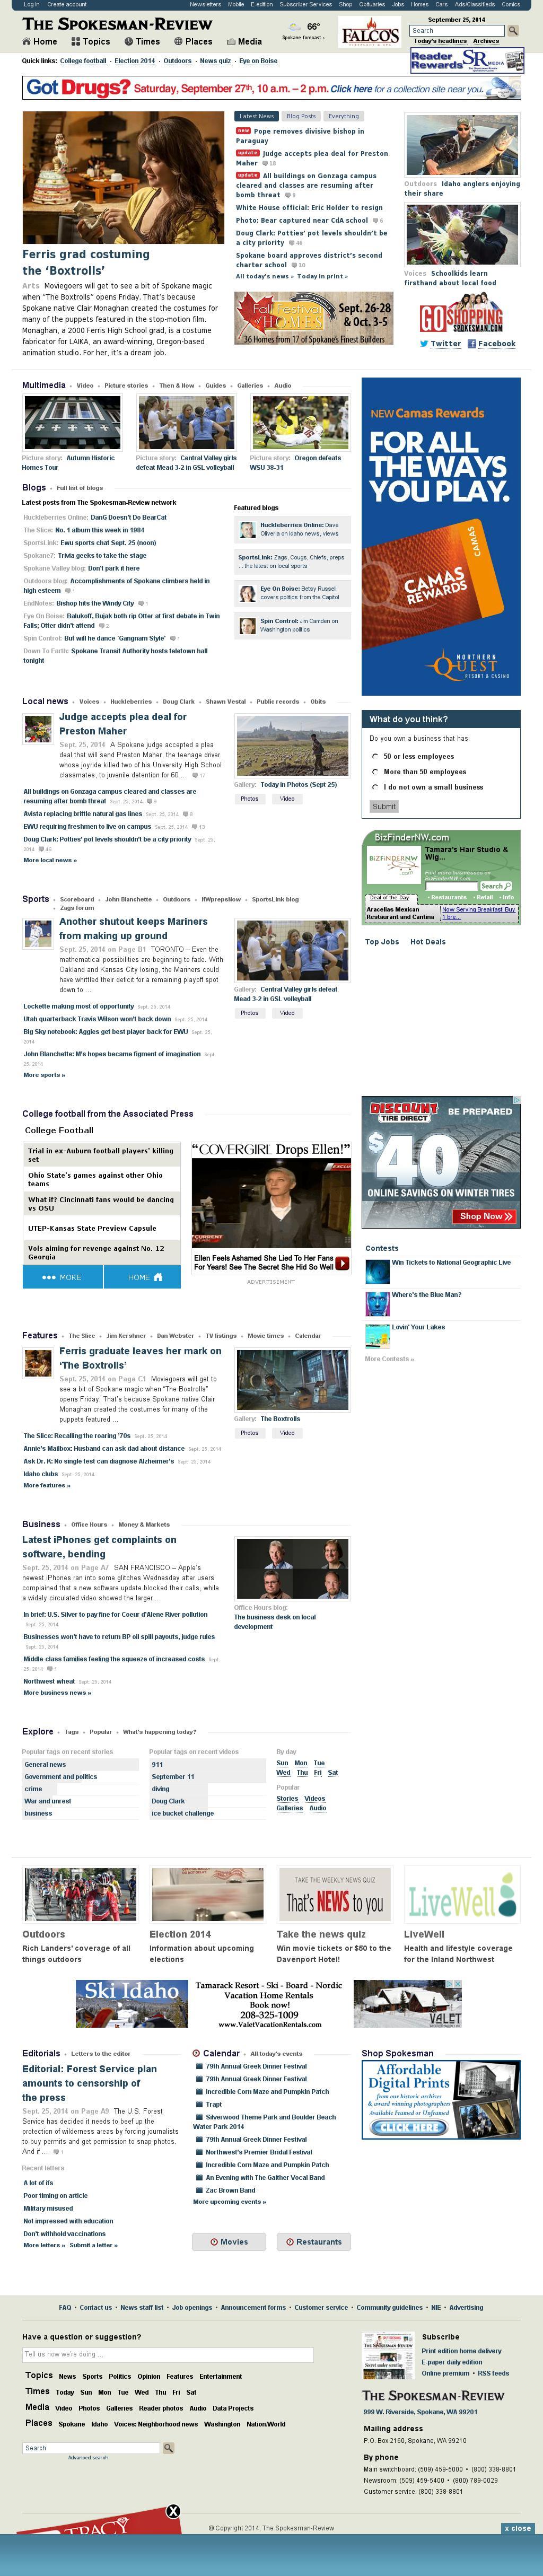 The (Spokane) Spokesman-Review at Thursday Sept. 25, 2014, 7:23 p.m. UTC